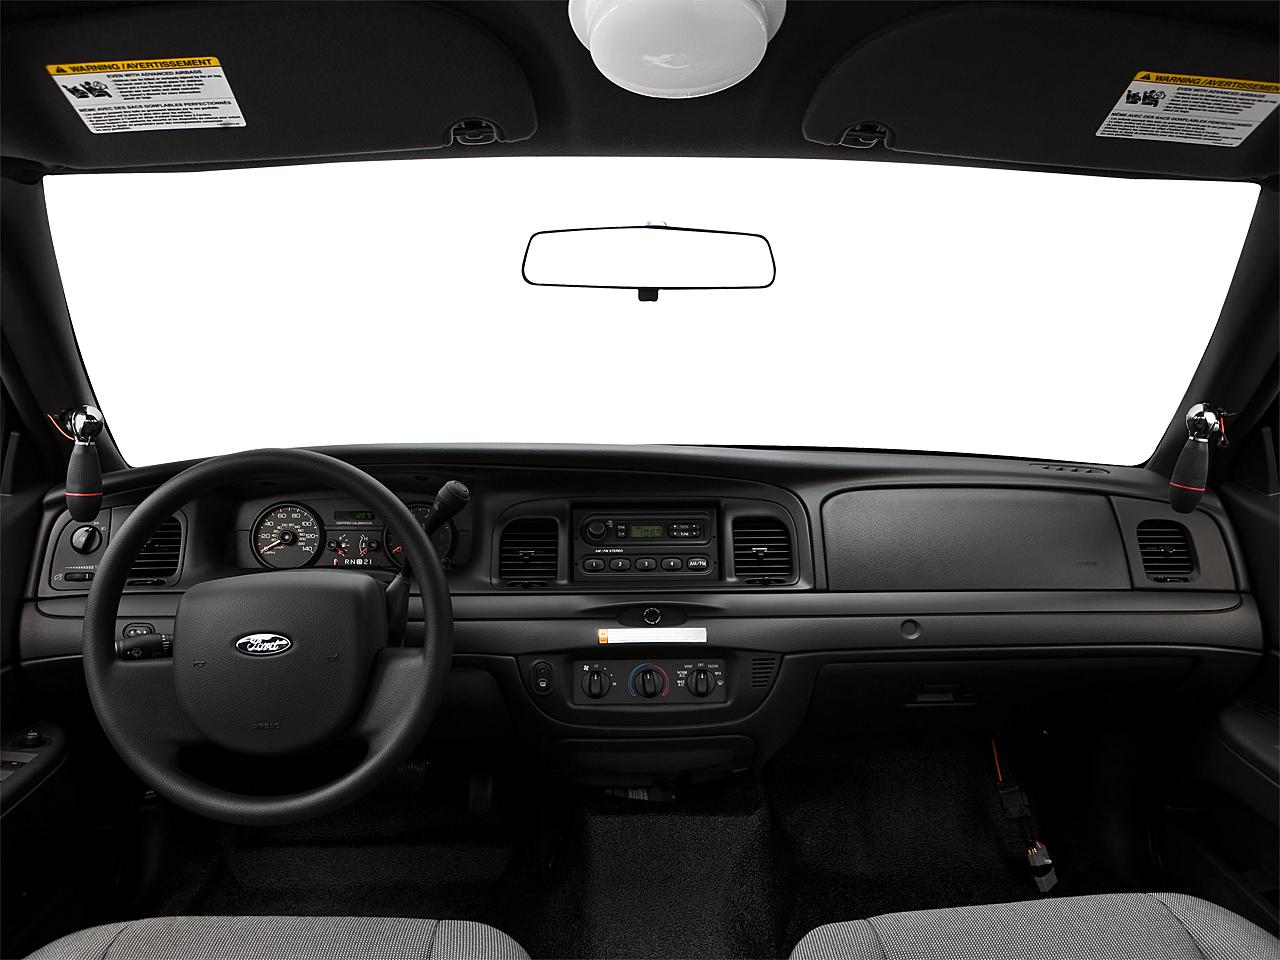 2009 Ford Crown Victoria Police Interceptor 4dr Sedan (3 55 Axle